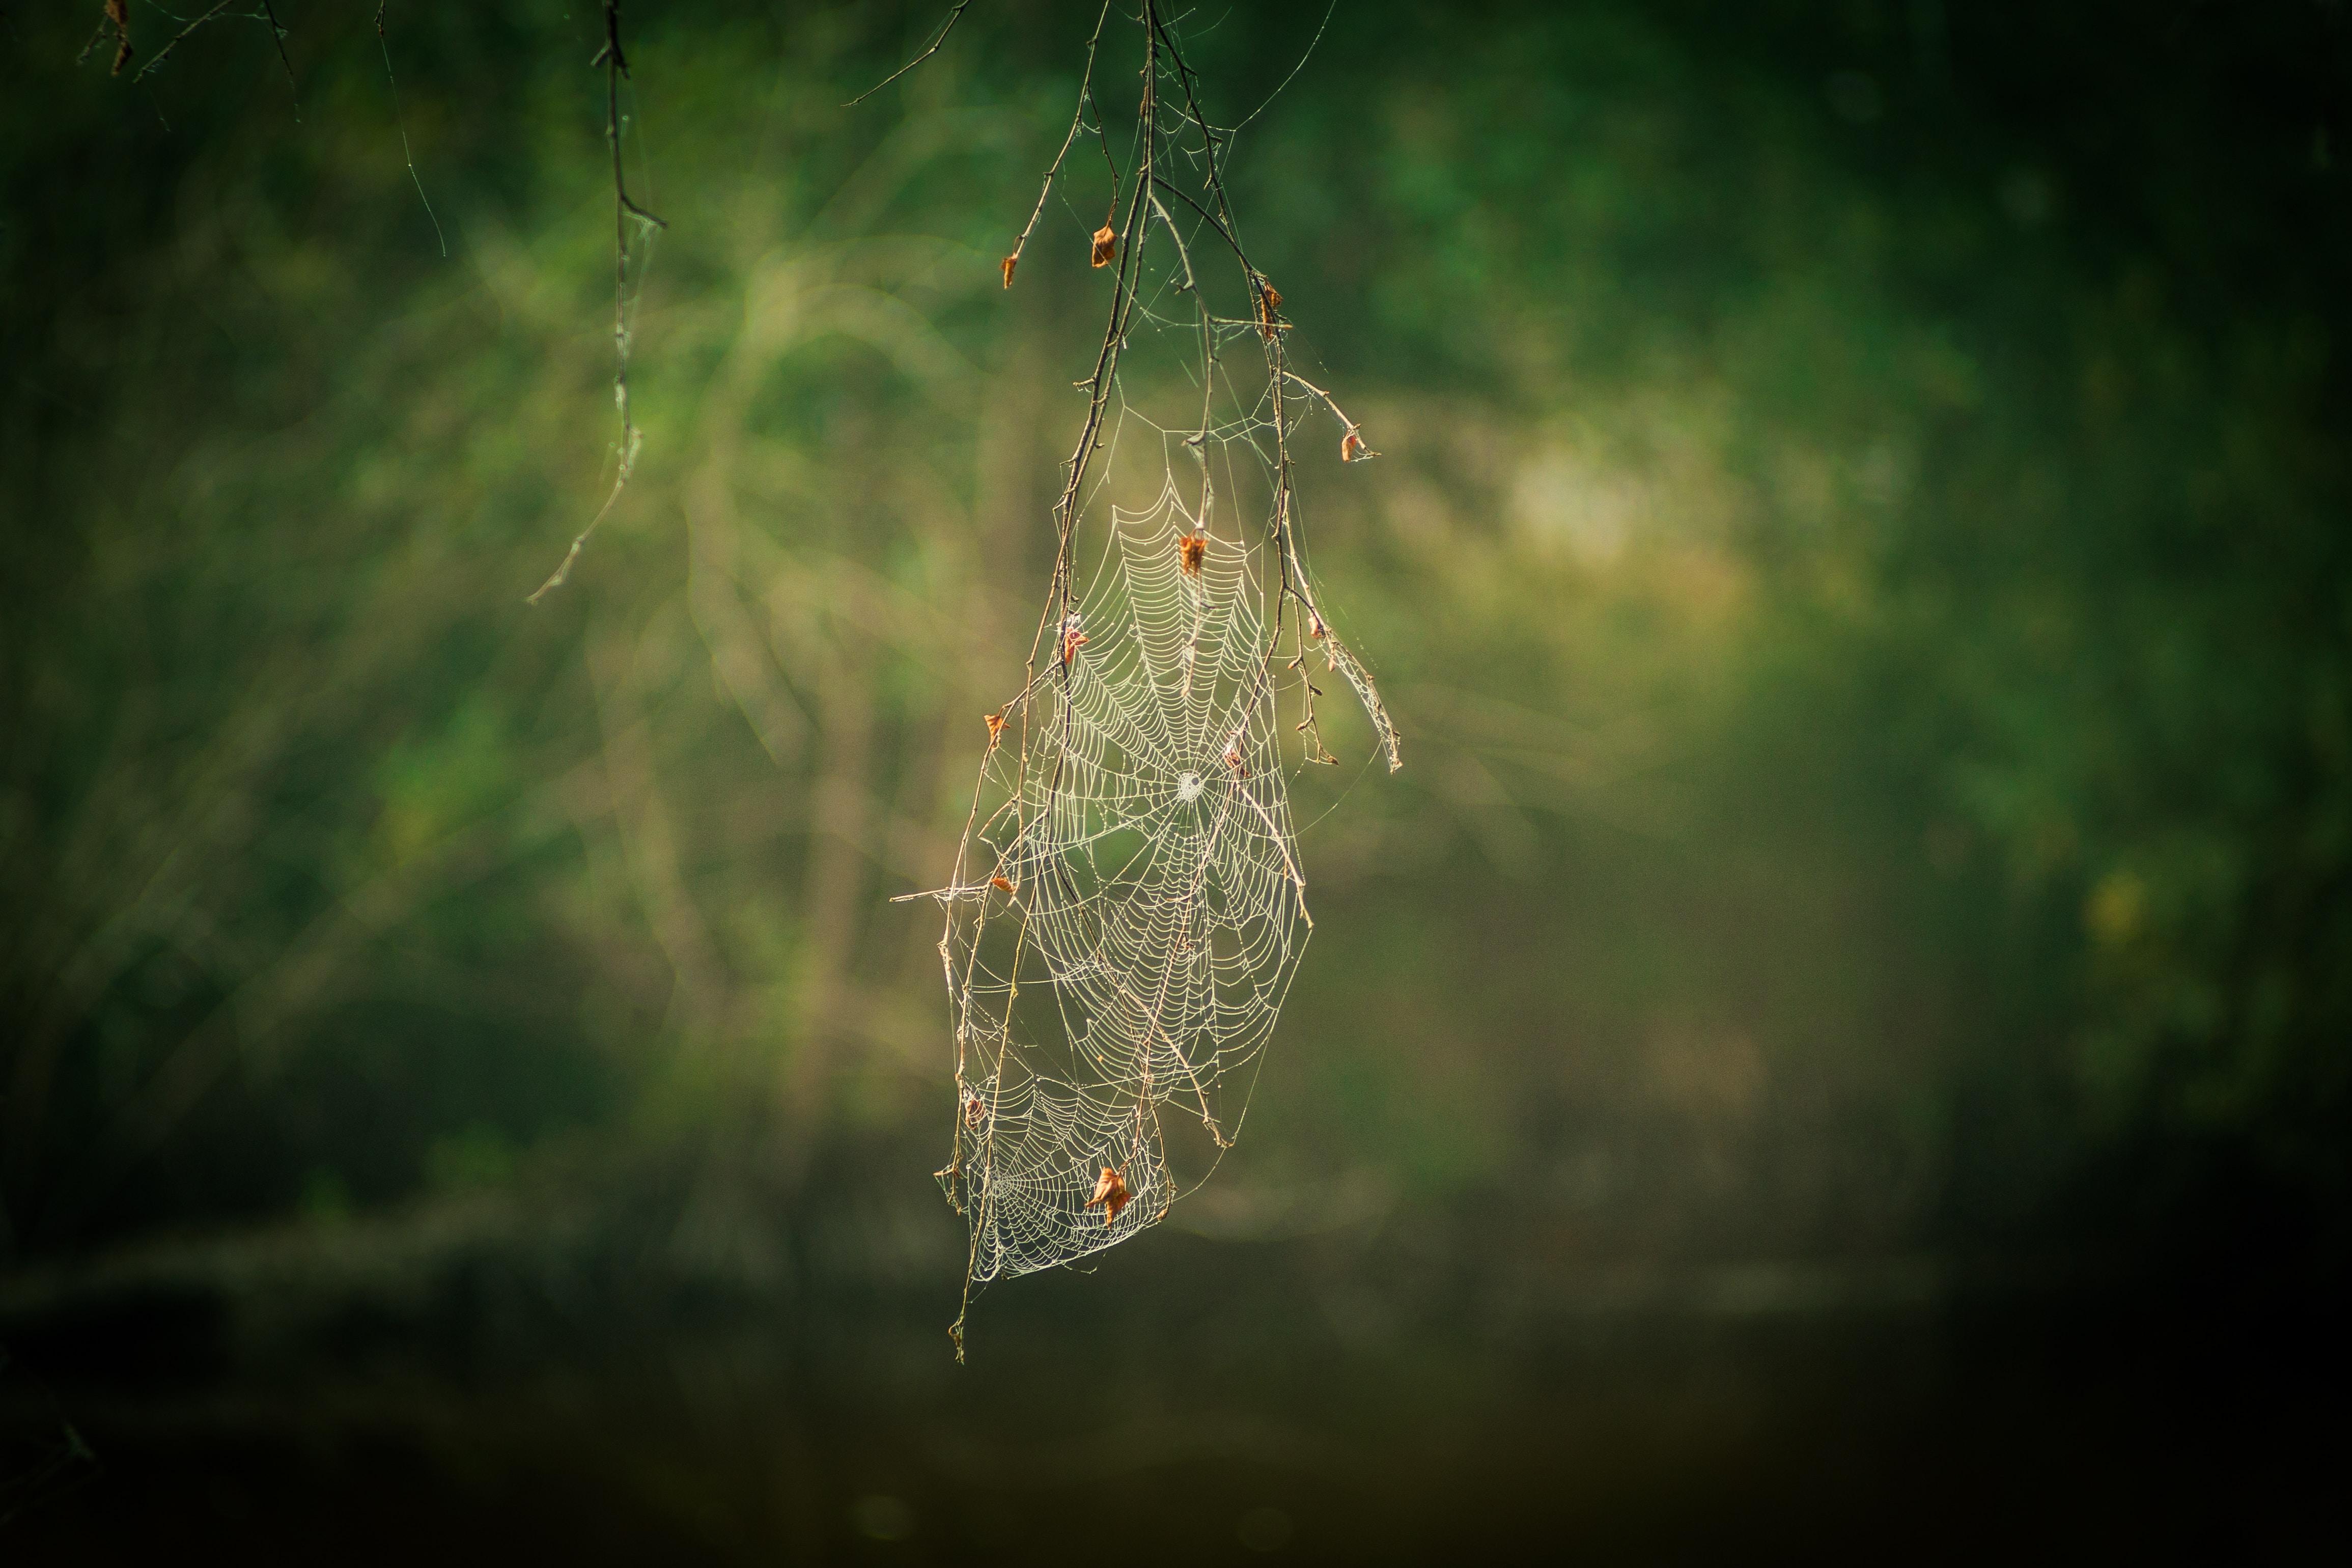 white spider web during daytime